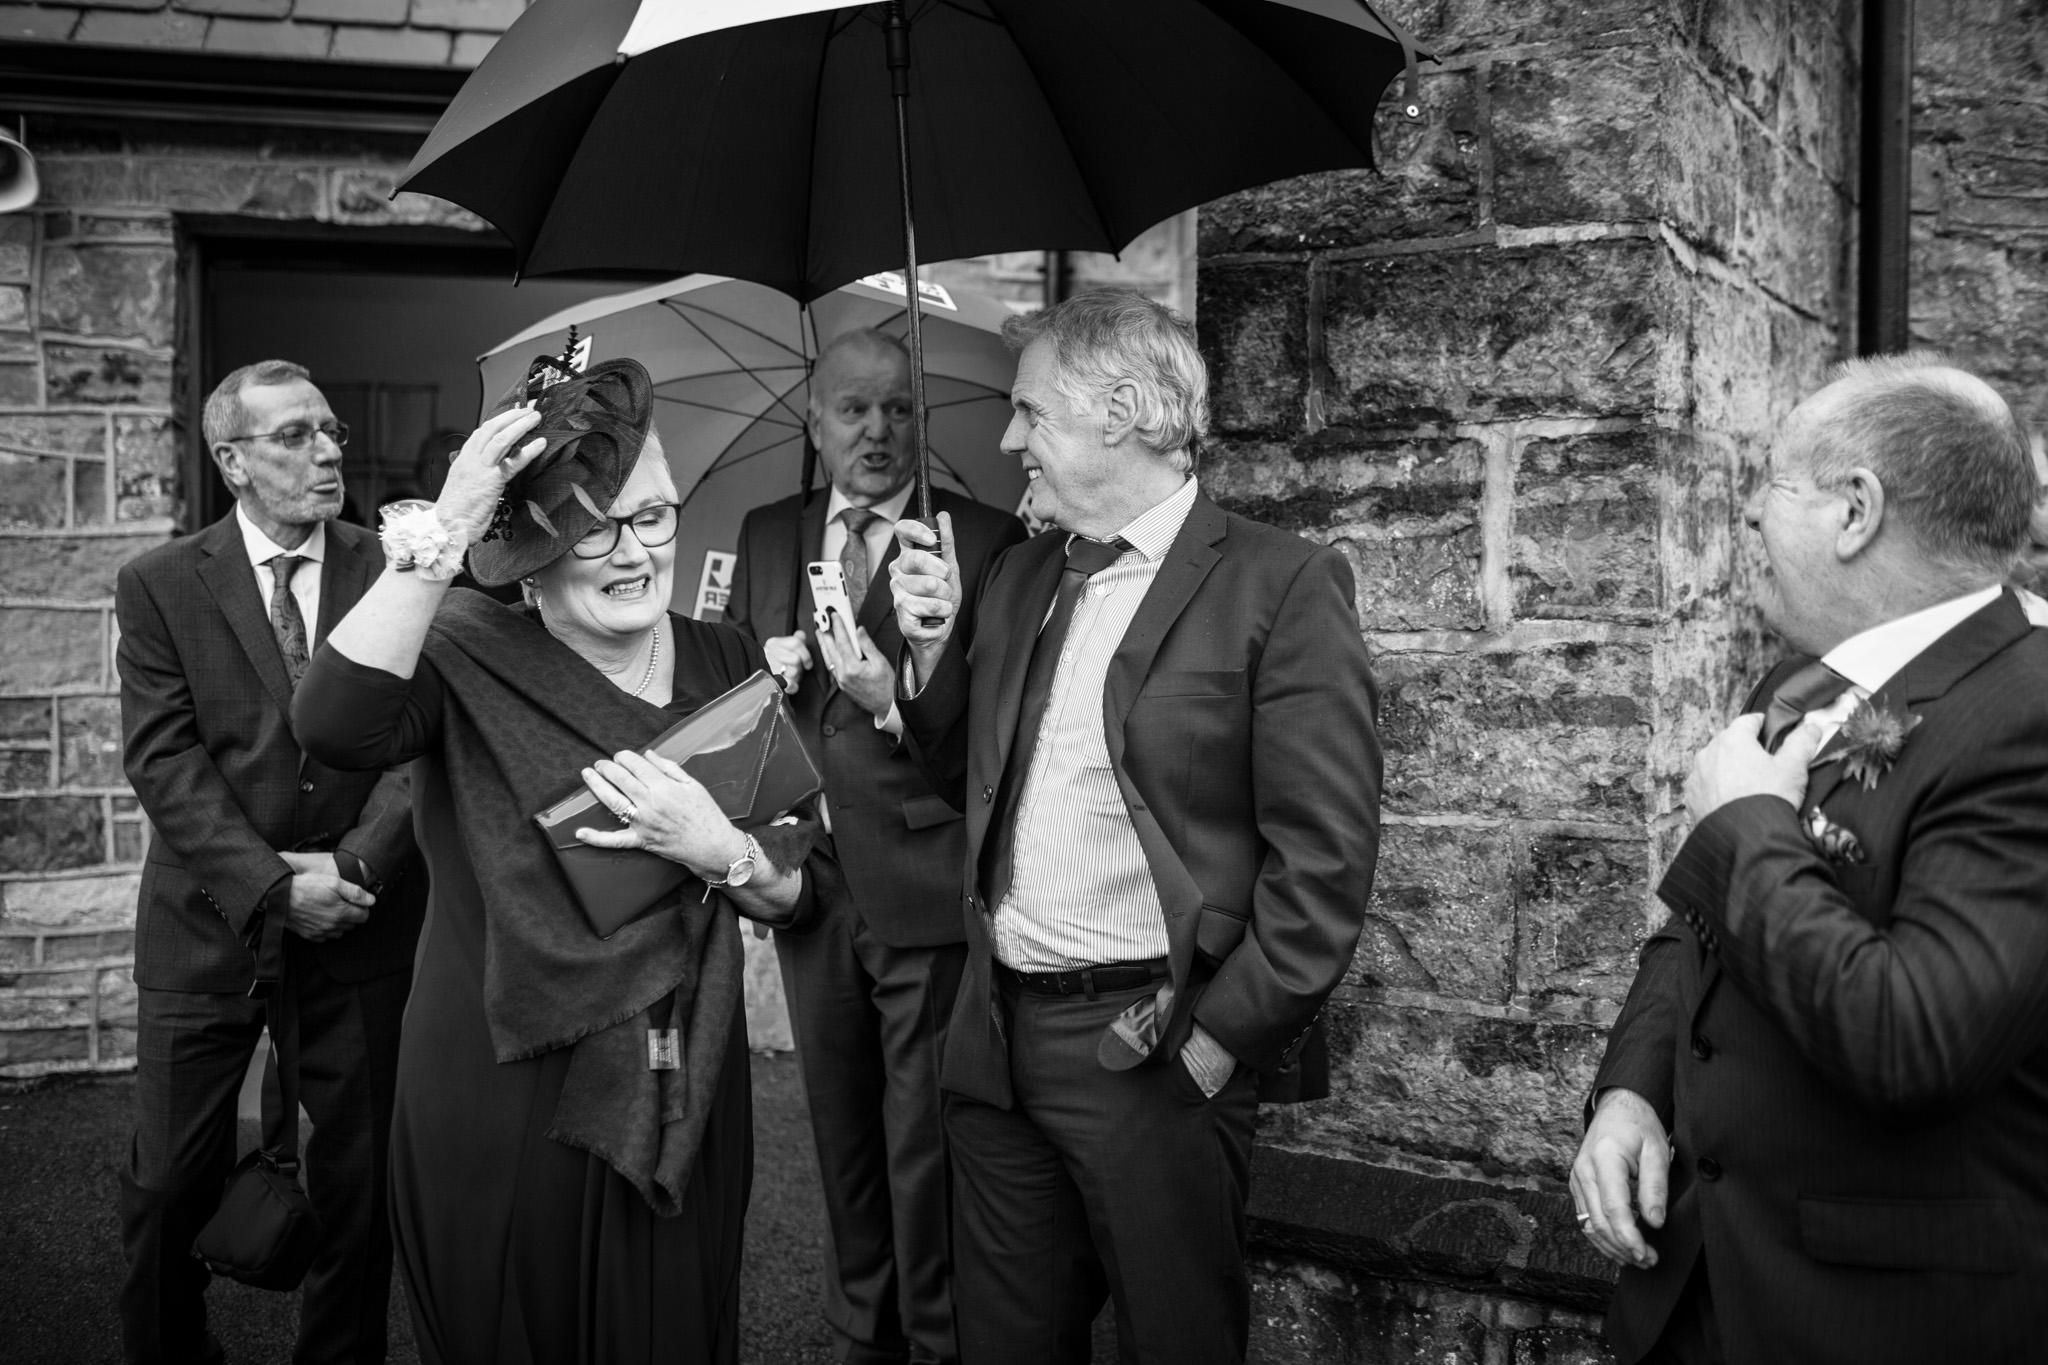 Mark_Barnes_Northern_Ireland_wedding_photographer_Harveys_Point_Donegall_Wedding_photography-Adam&Gemma-30.jpg